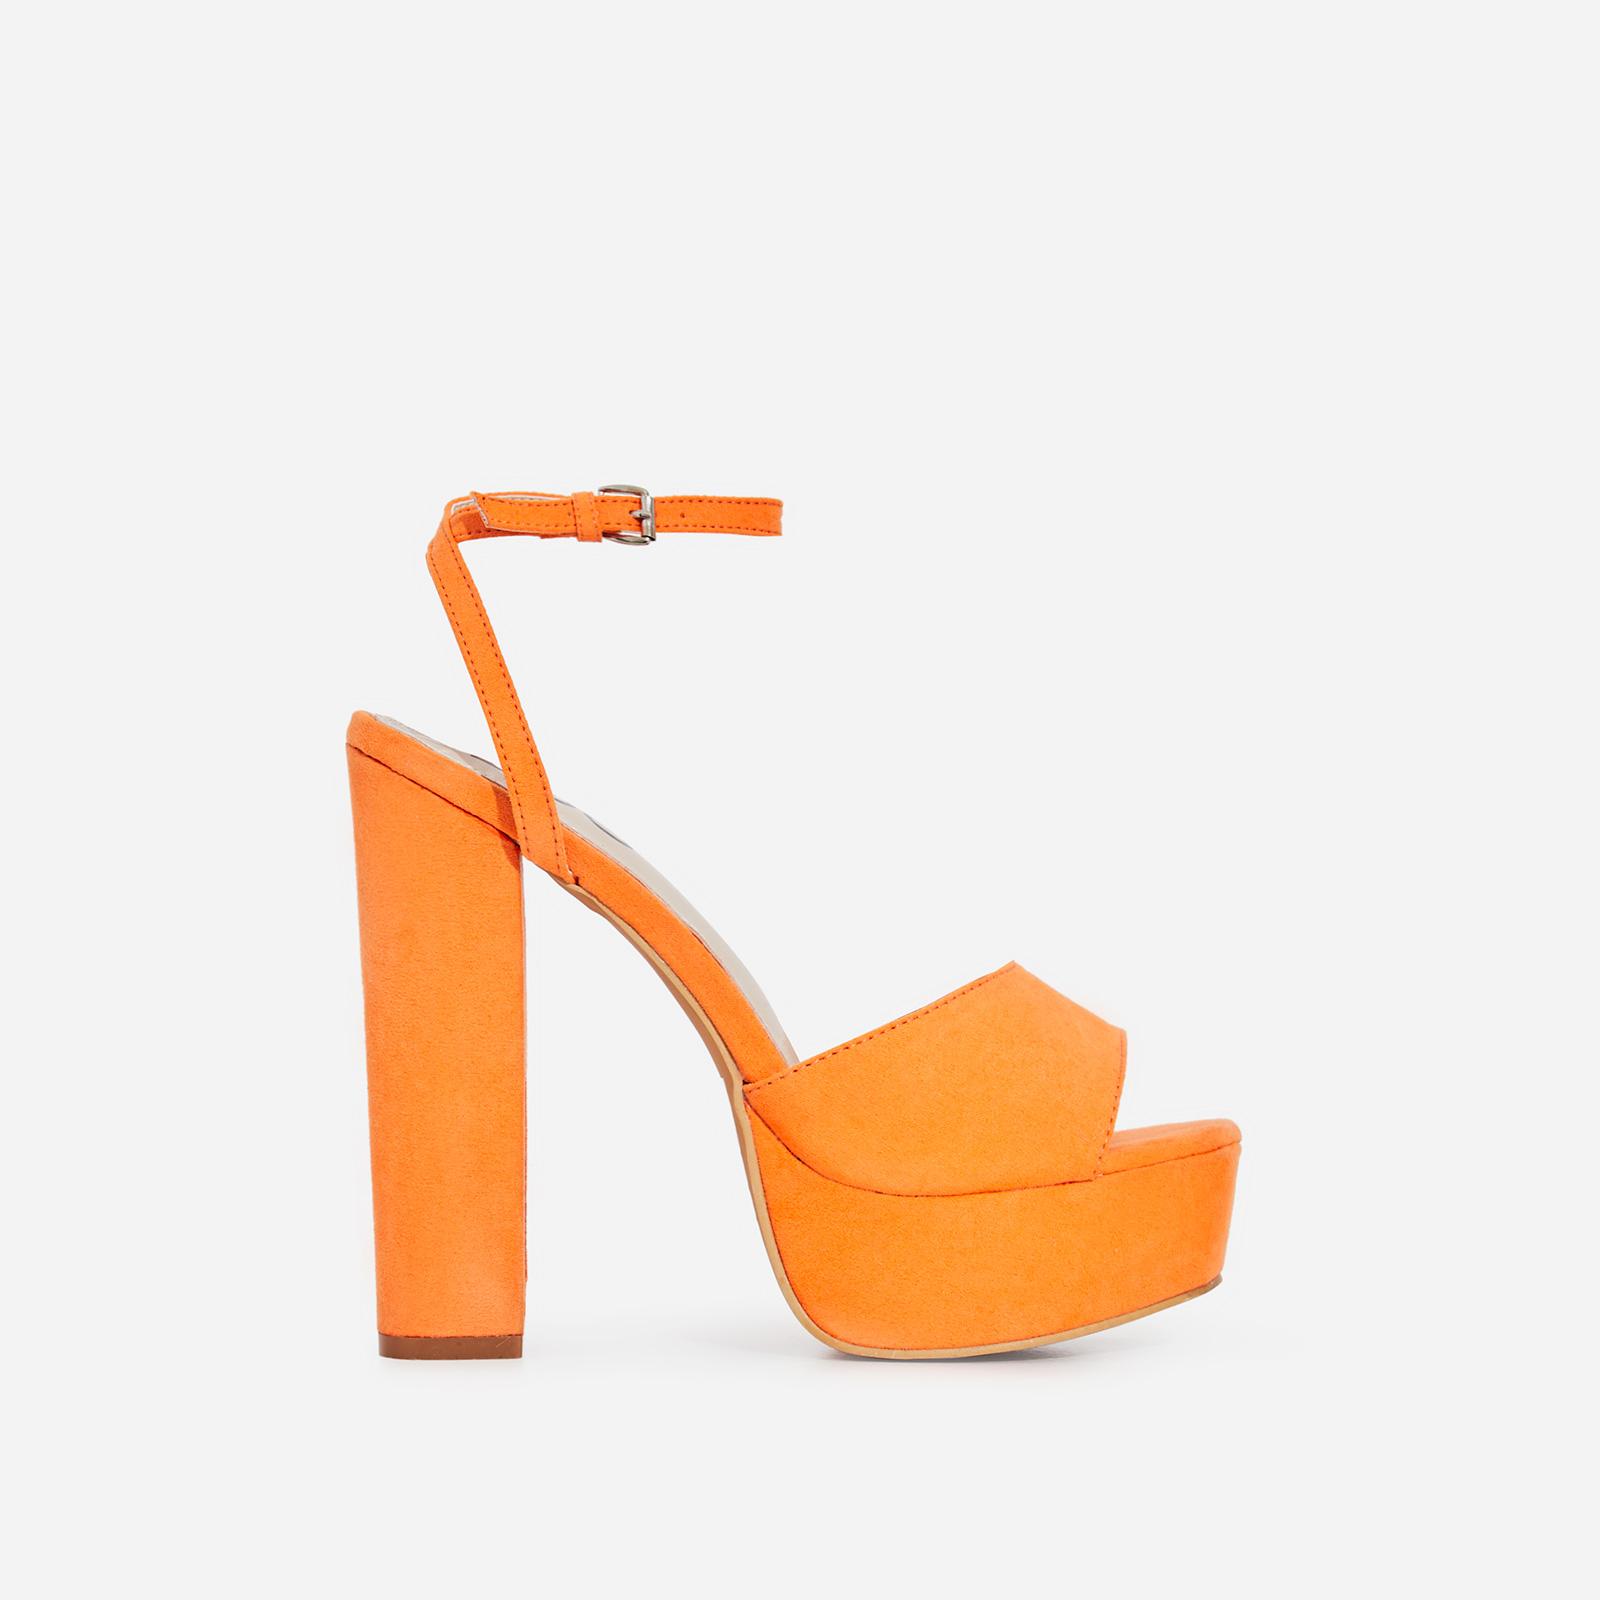 Kaci Platform Block Heel In Neon Orange Faux Suede